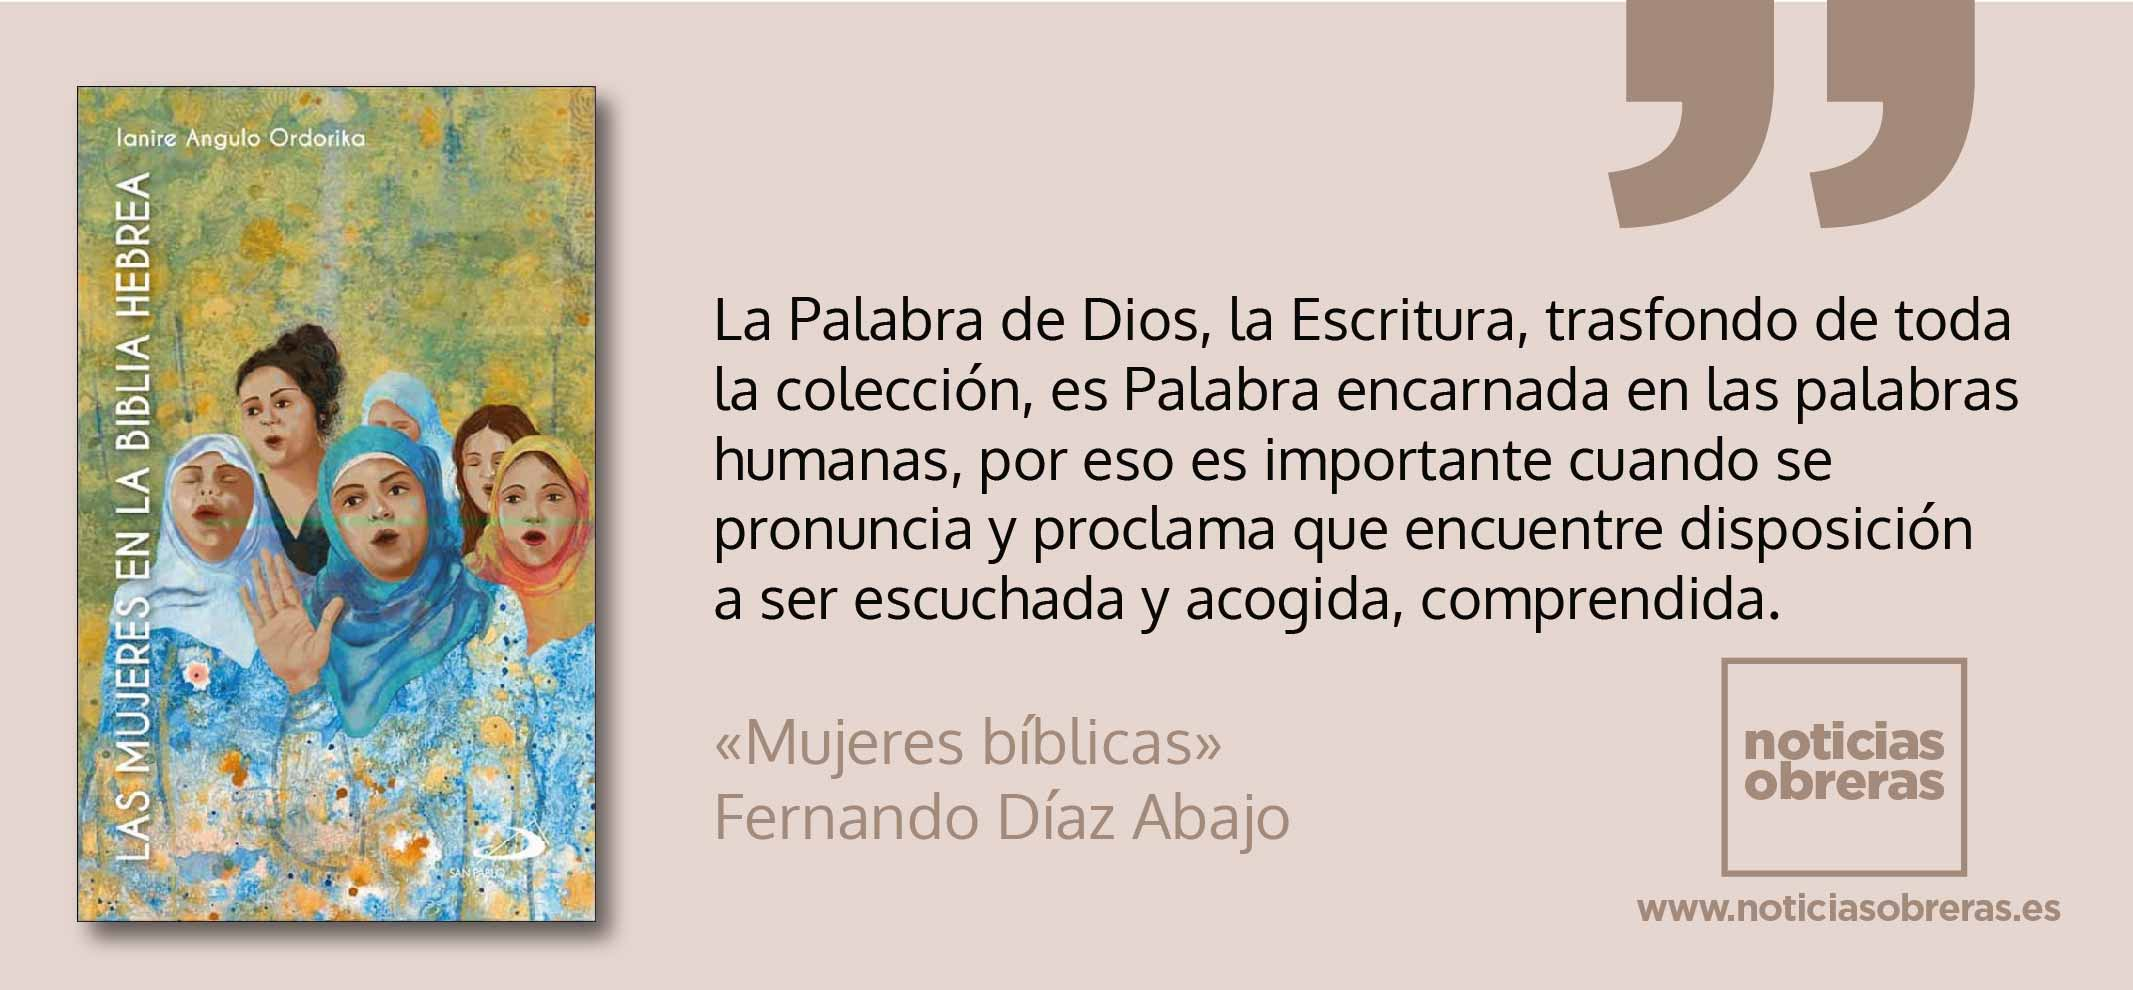 Mujeres bíblicas